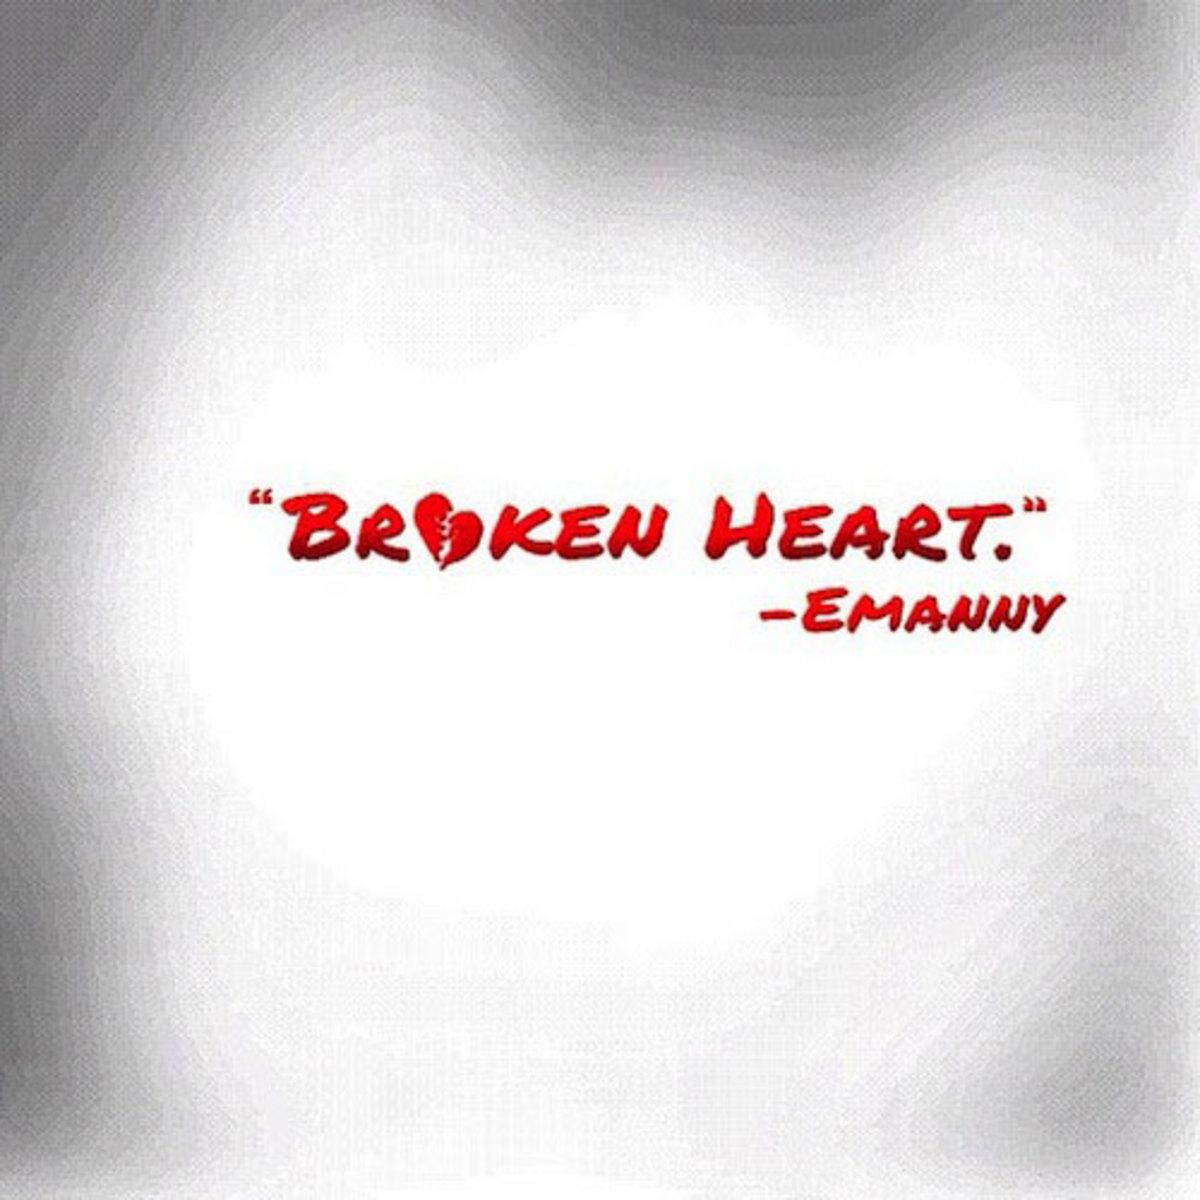 emanny-brokenheart.jpg